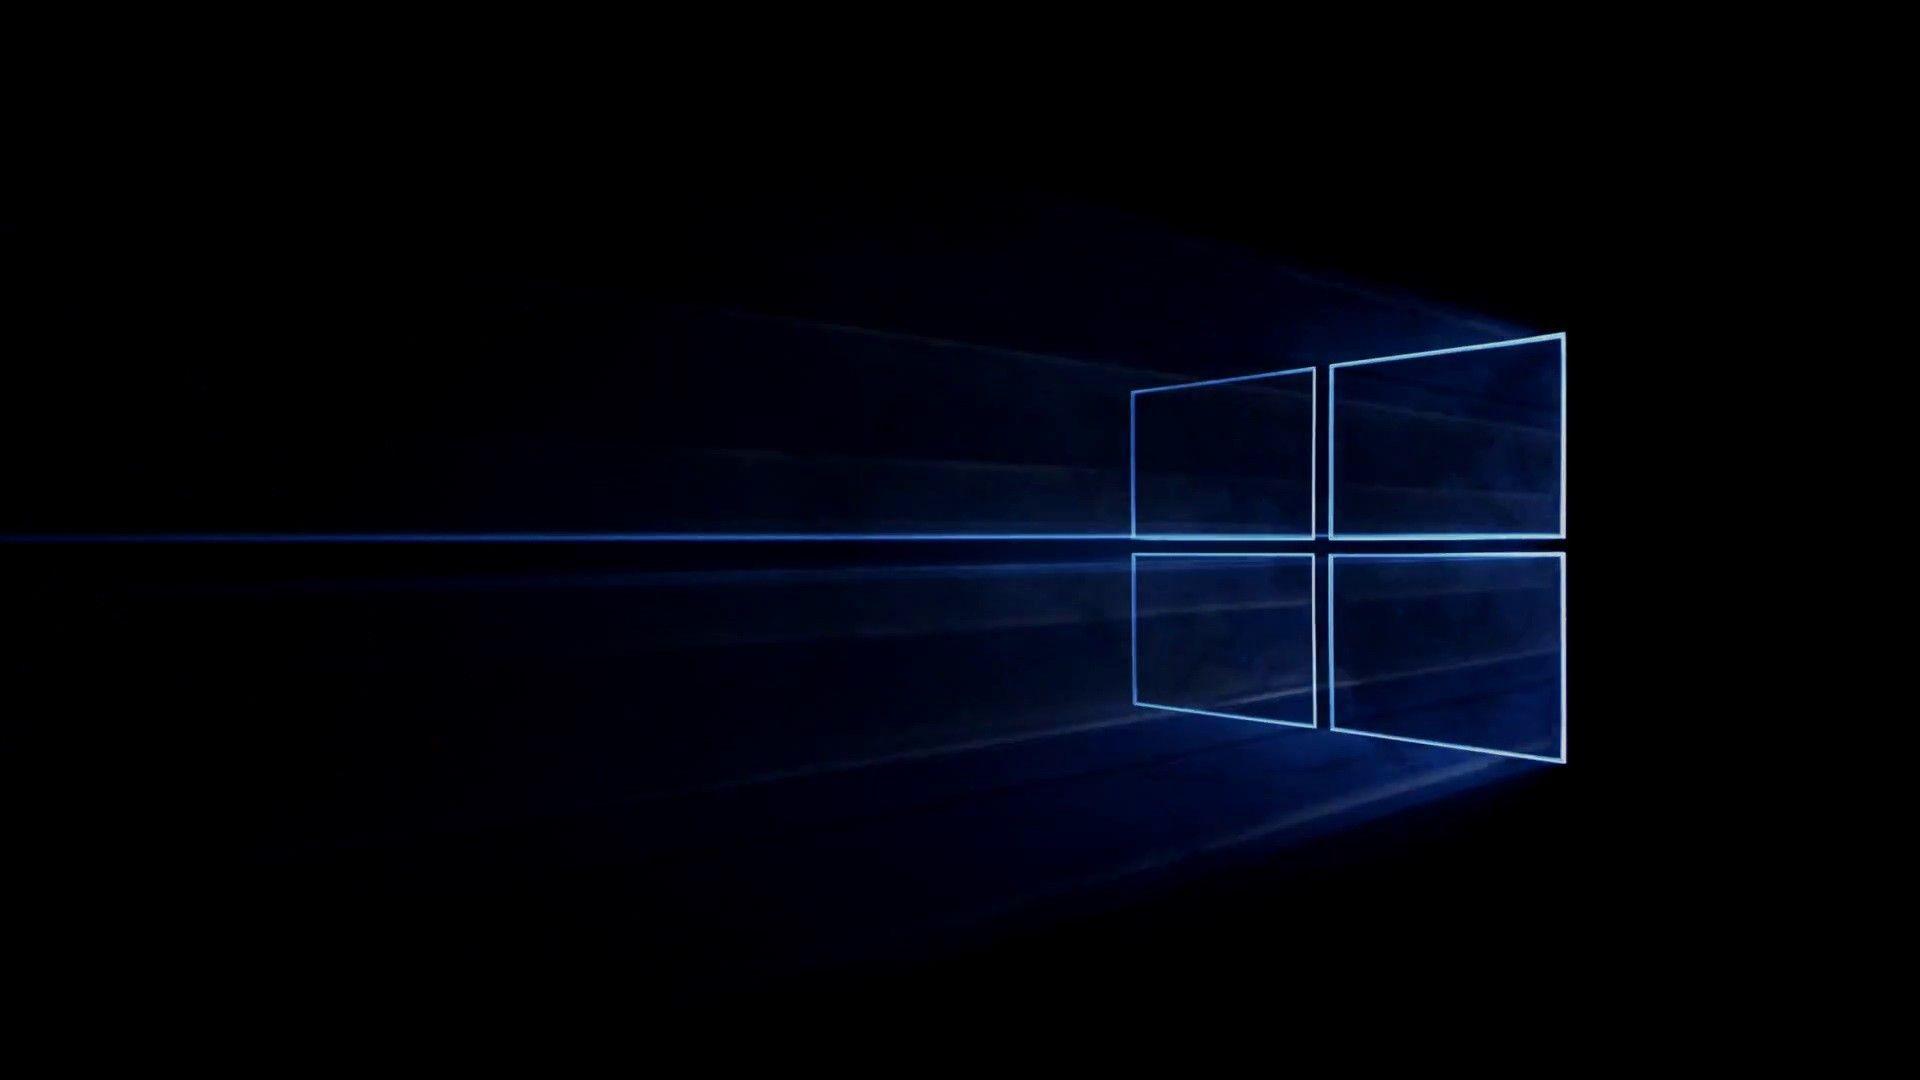 Windows 10 Dark Wallpapers Wallpaper Cave